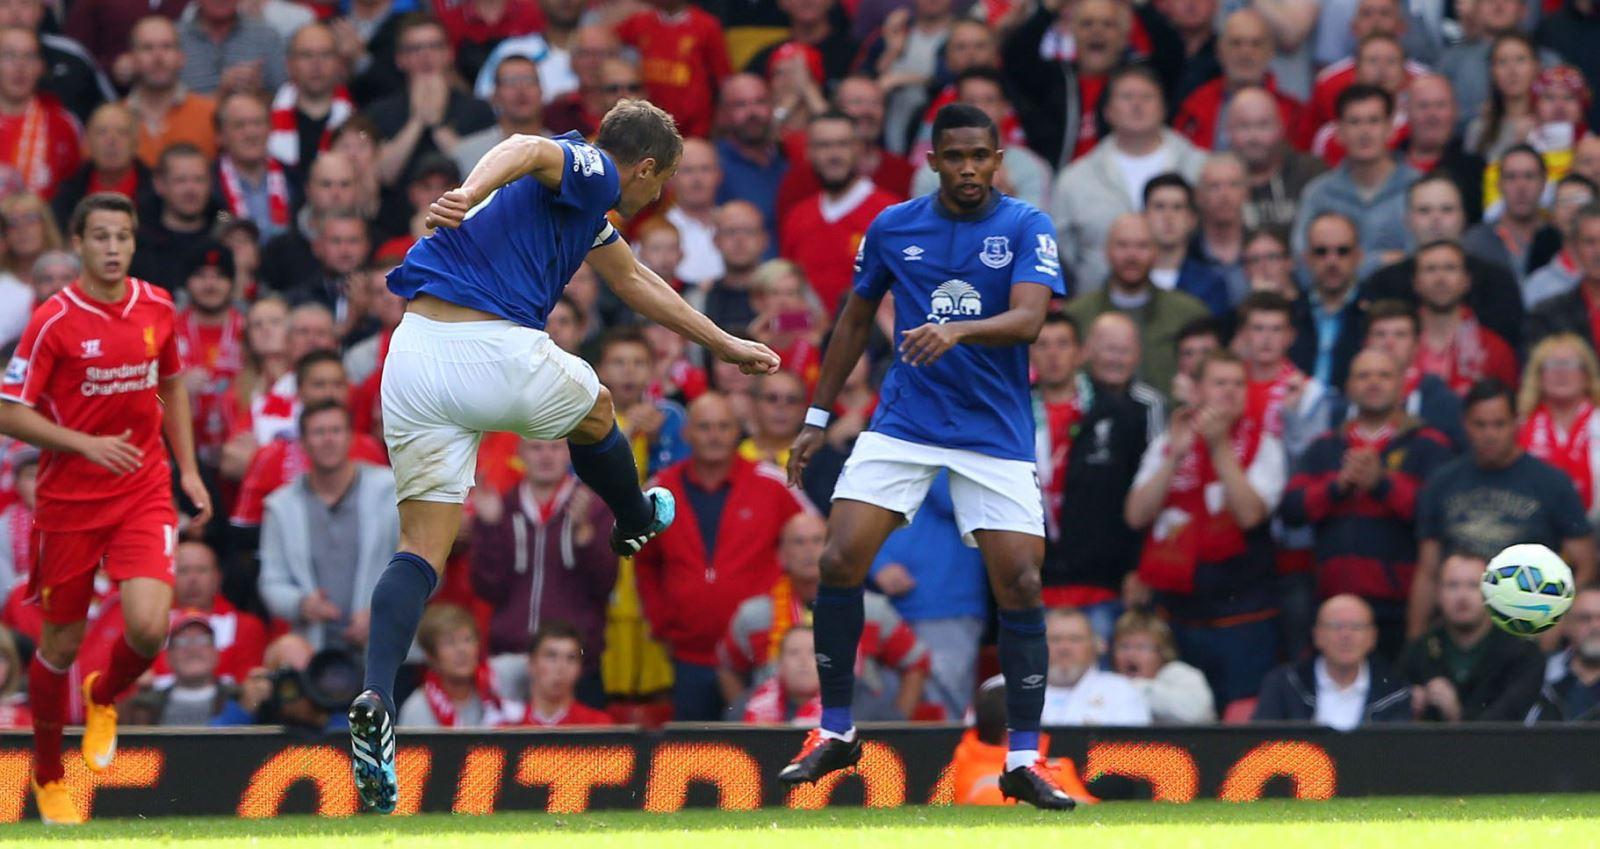 Liverpool vs Everton, liverpool, everton, trực tiếp bóng đá, trực tiếp liverpool vs everton, lịch thi đấu, lịch thi đấu bóng đá